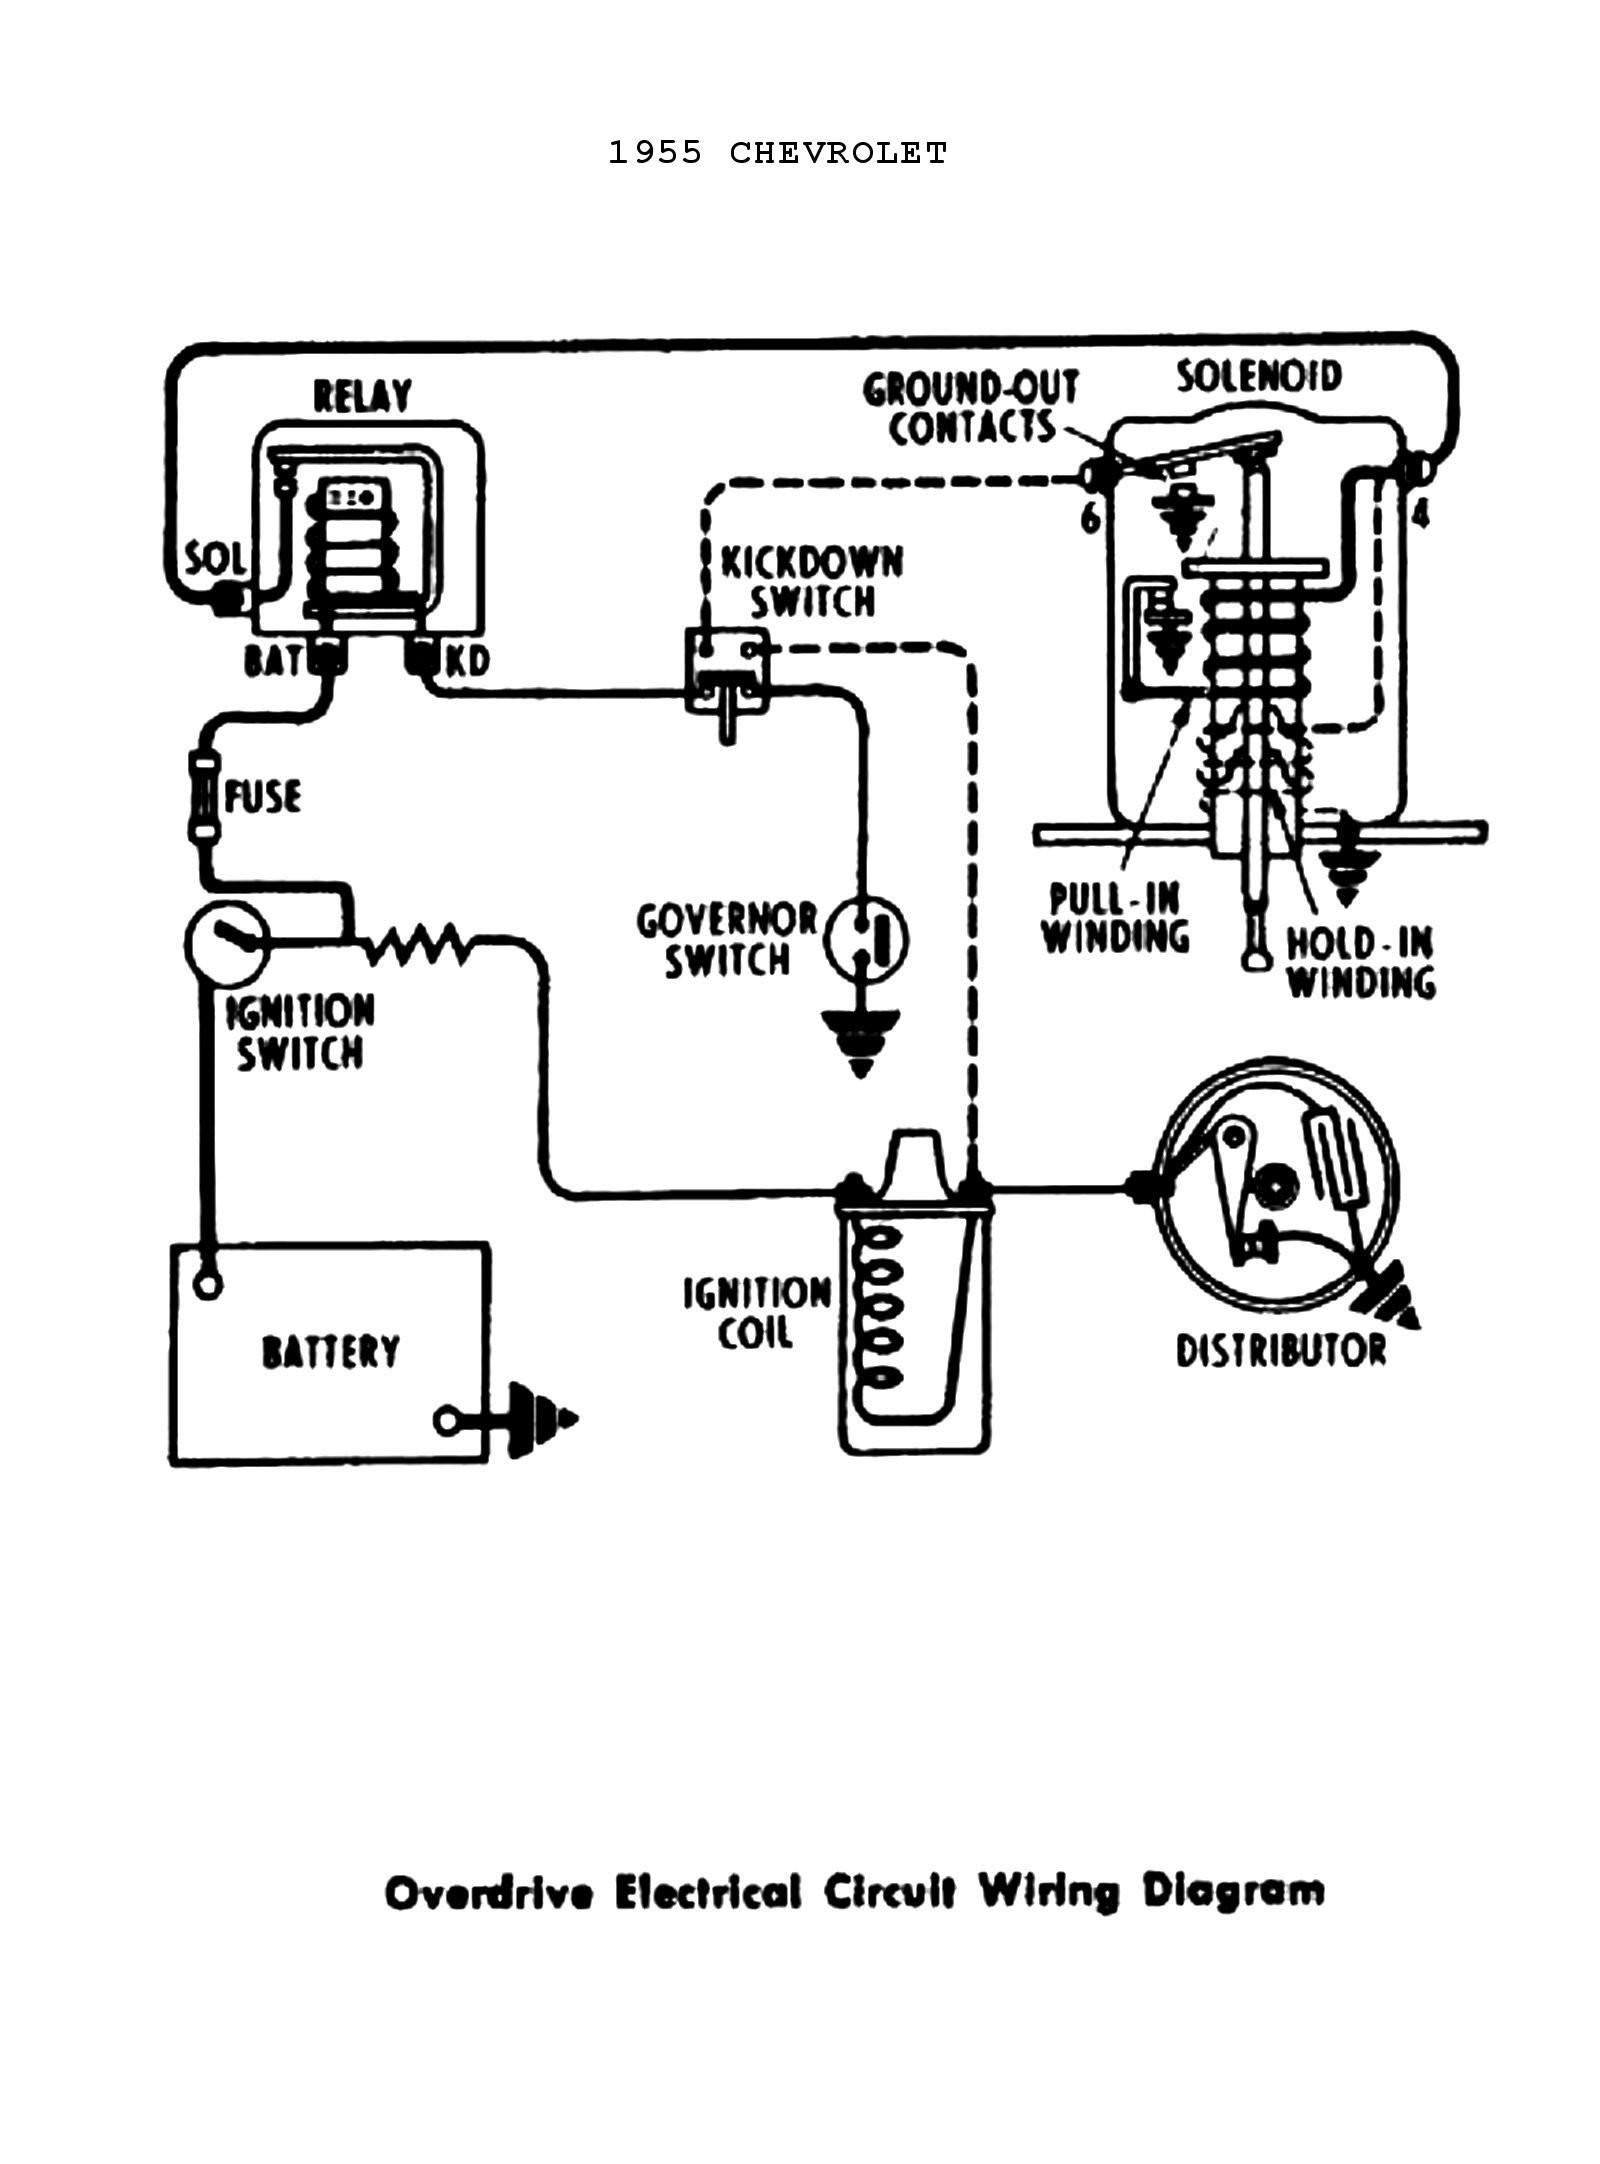 diagram of coil ignition system car ignition system wiring diagram rh detoxicrecenze com wiring diagram ballast resistor ignition coil ignition coil wiring diagram chevy